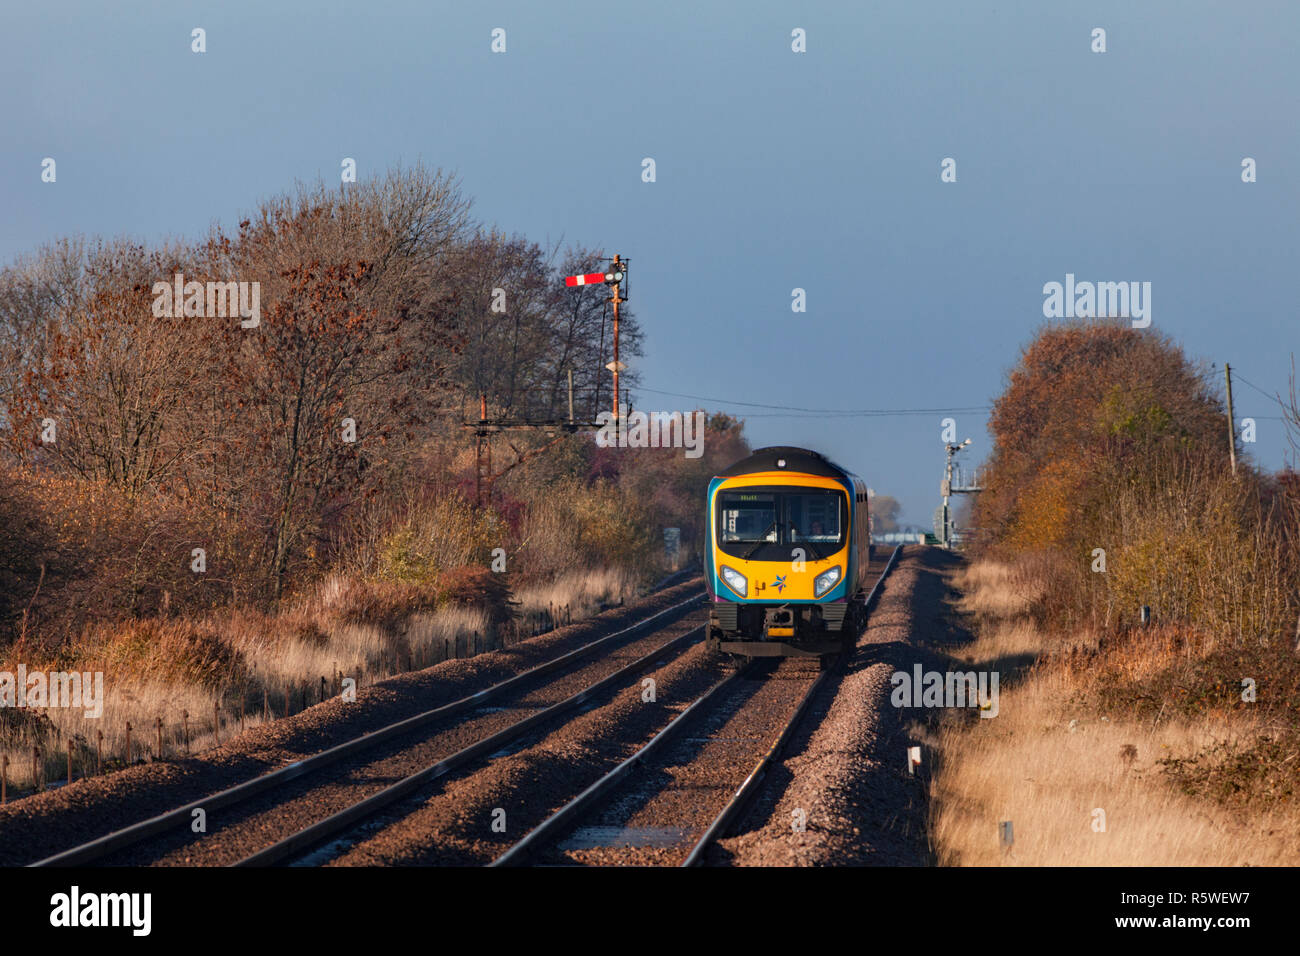 First Transpennine Express class 185 train passing the mechanical bracket semaphore signal at Broomfleet, east Yorkshire Stock Photo